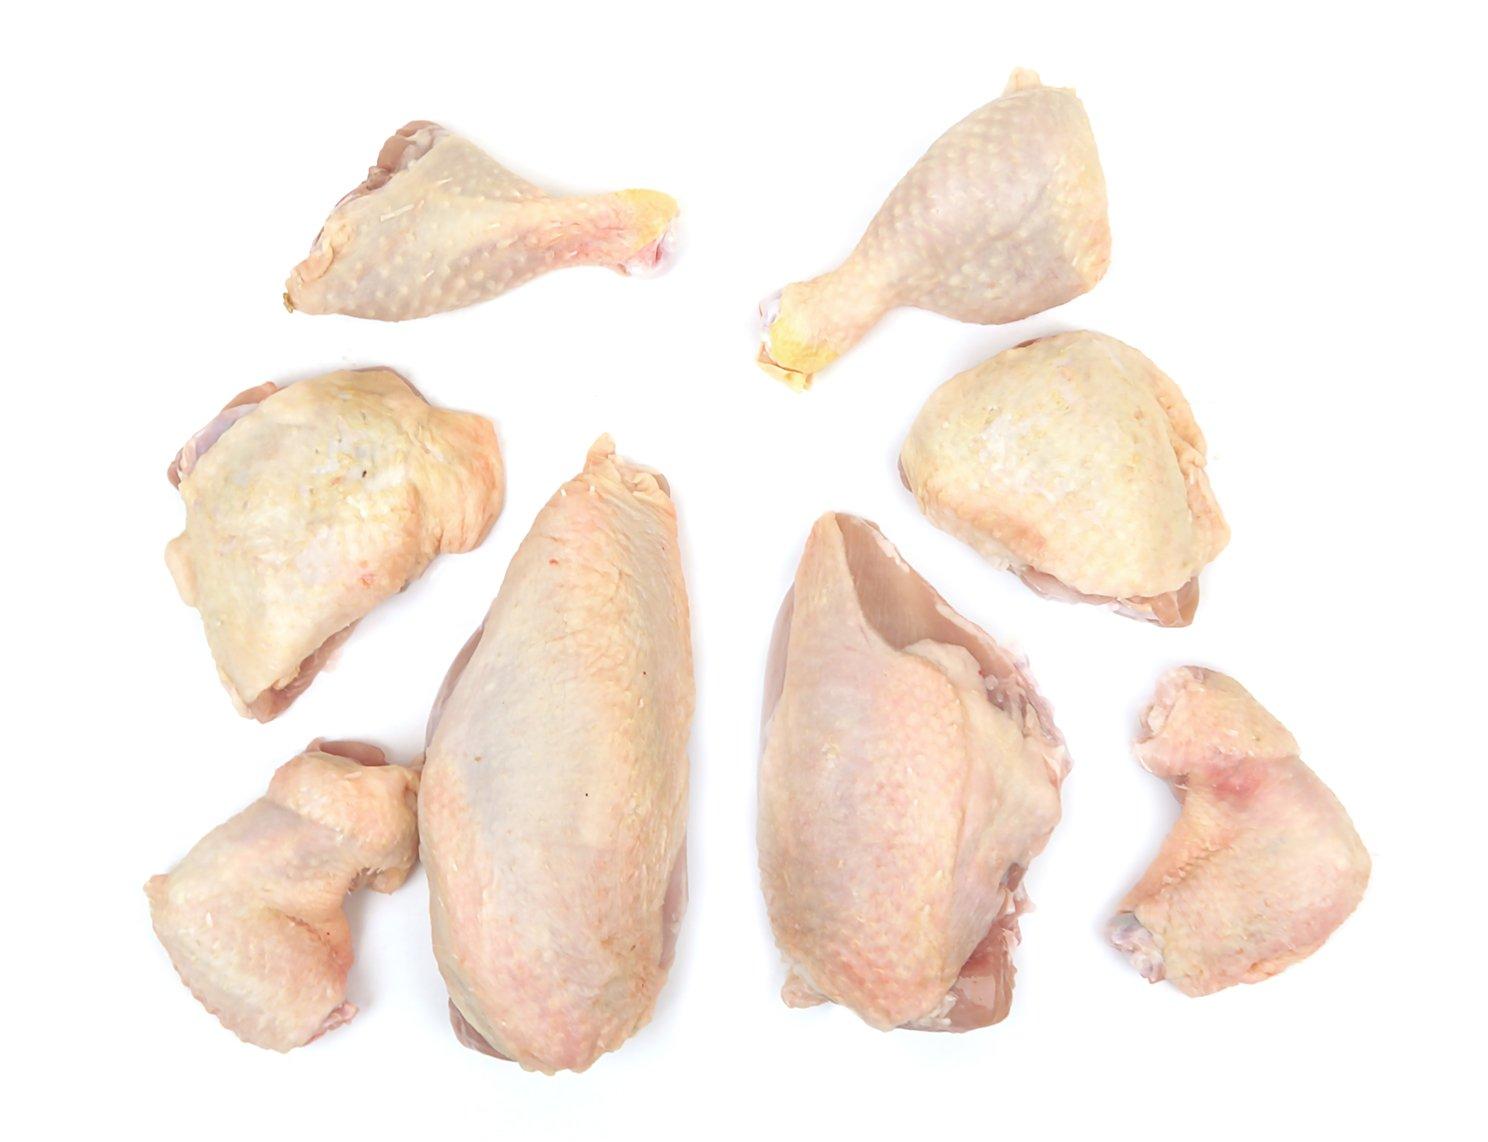 Double Certified Organic Chicken Cut in Eights (10.25-10.75 Lbs) - Glatt Kosher